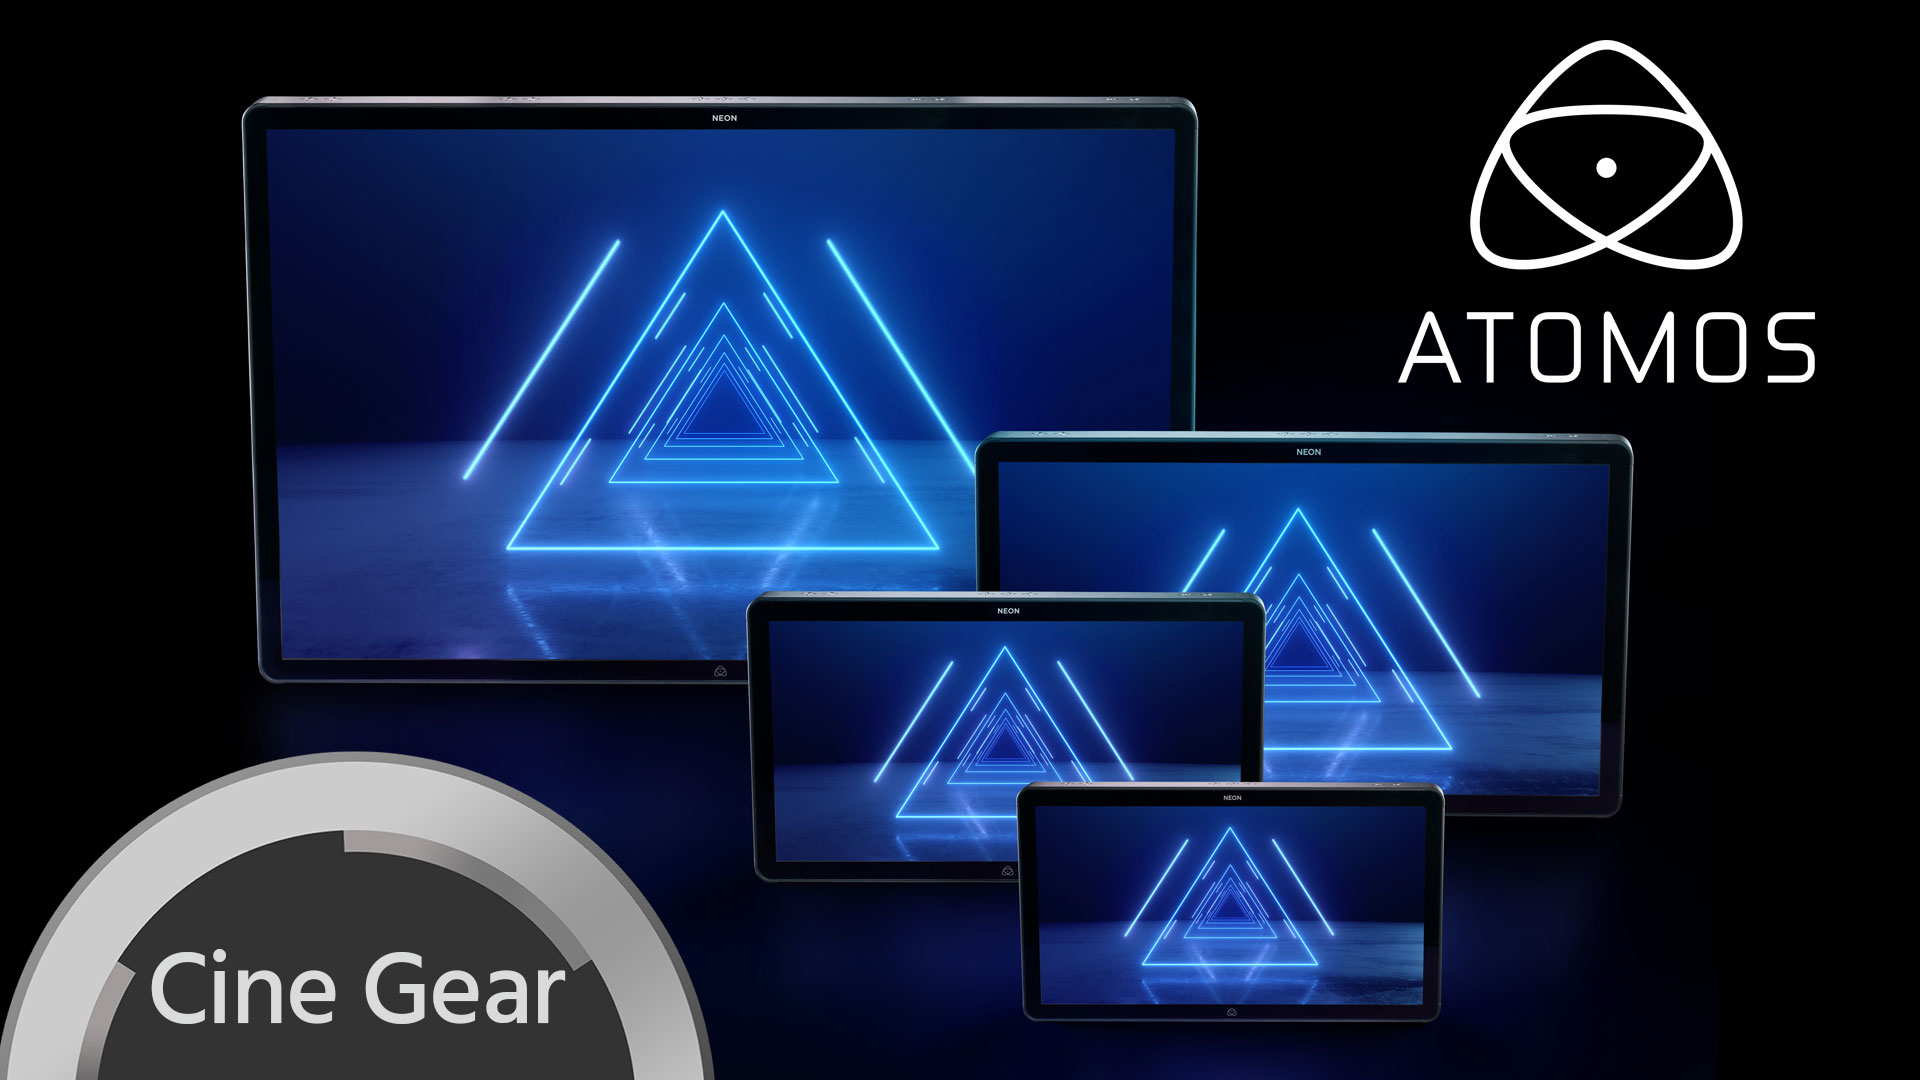 Monitor Atomos Neon Cinema – Anuncian Pantallas HDR grabadoras